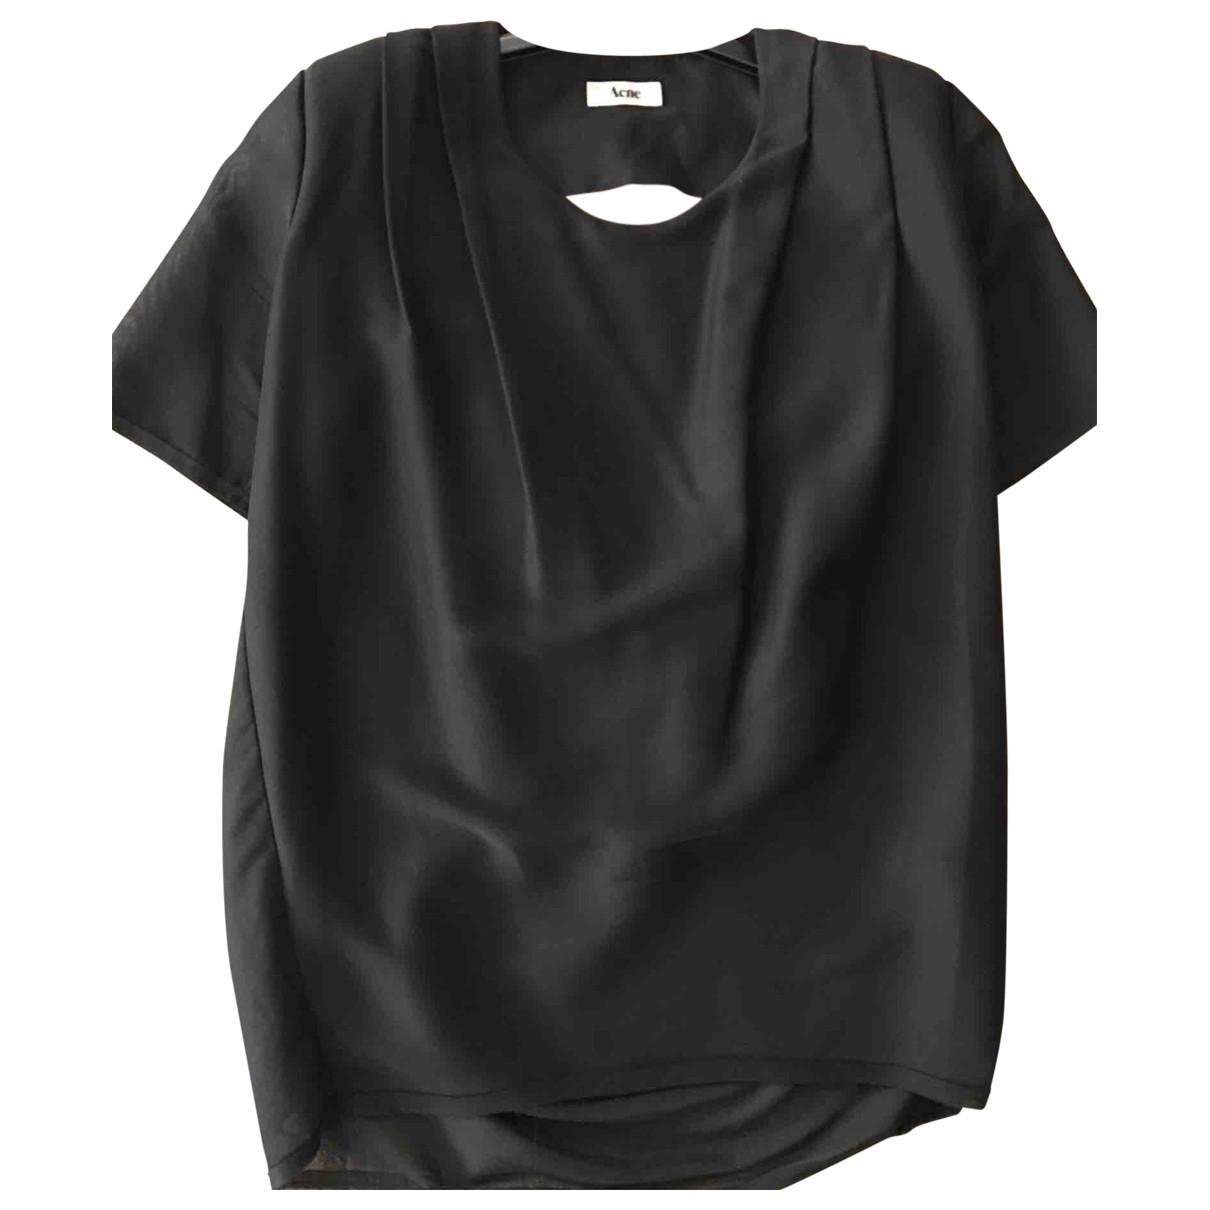 Acne Studios Black Polyester Top